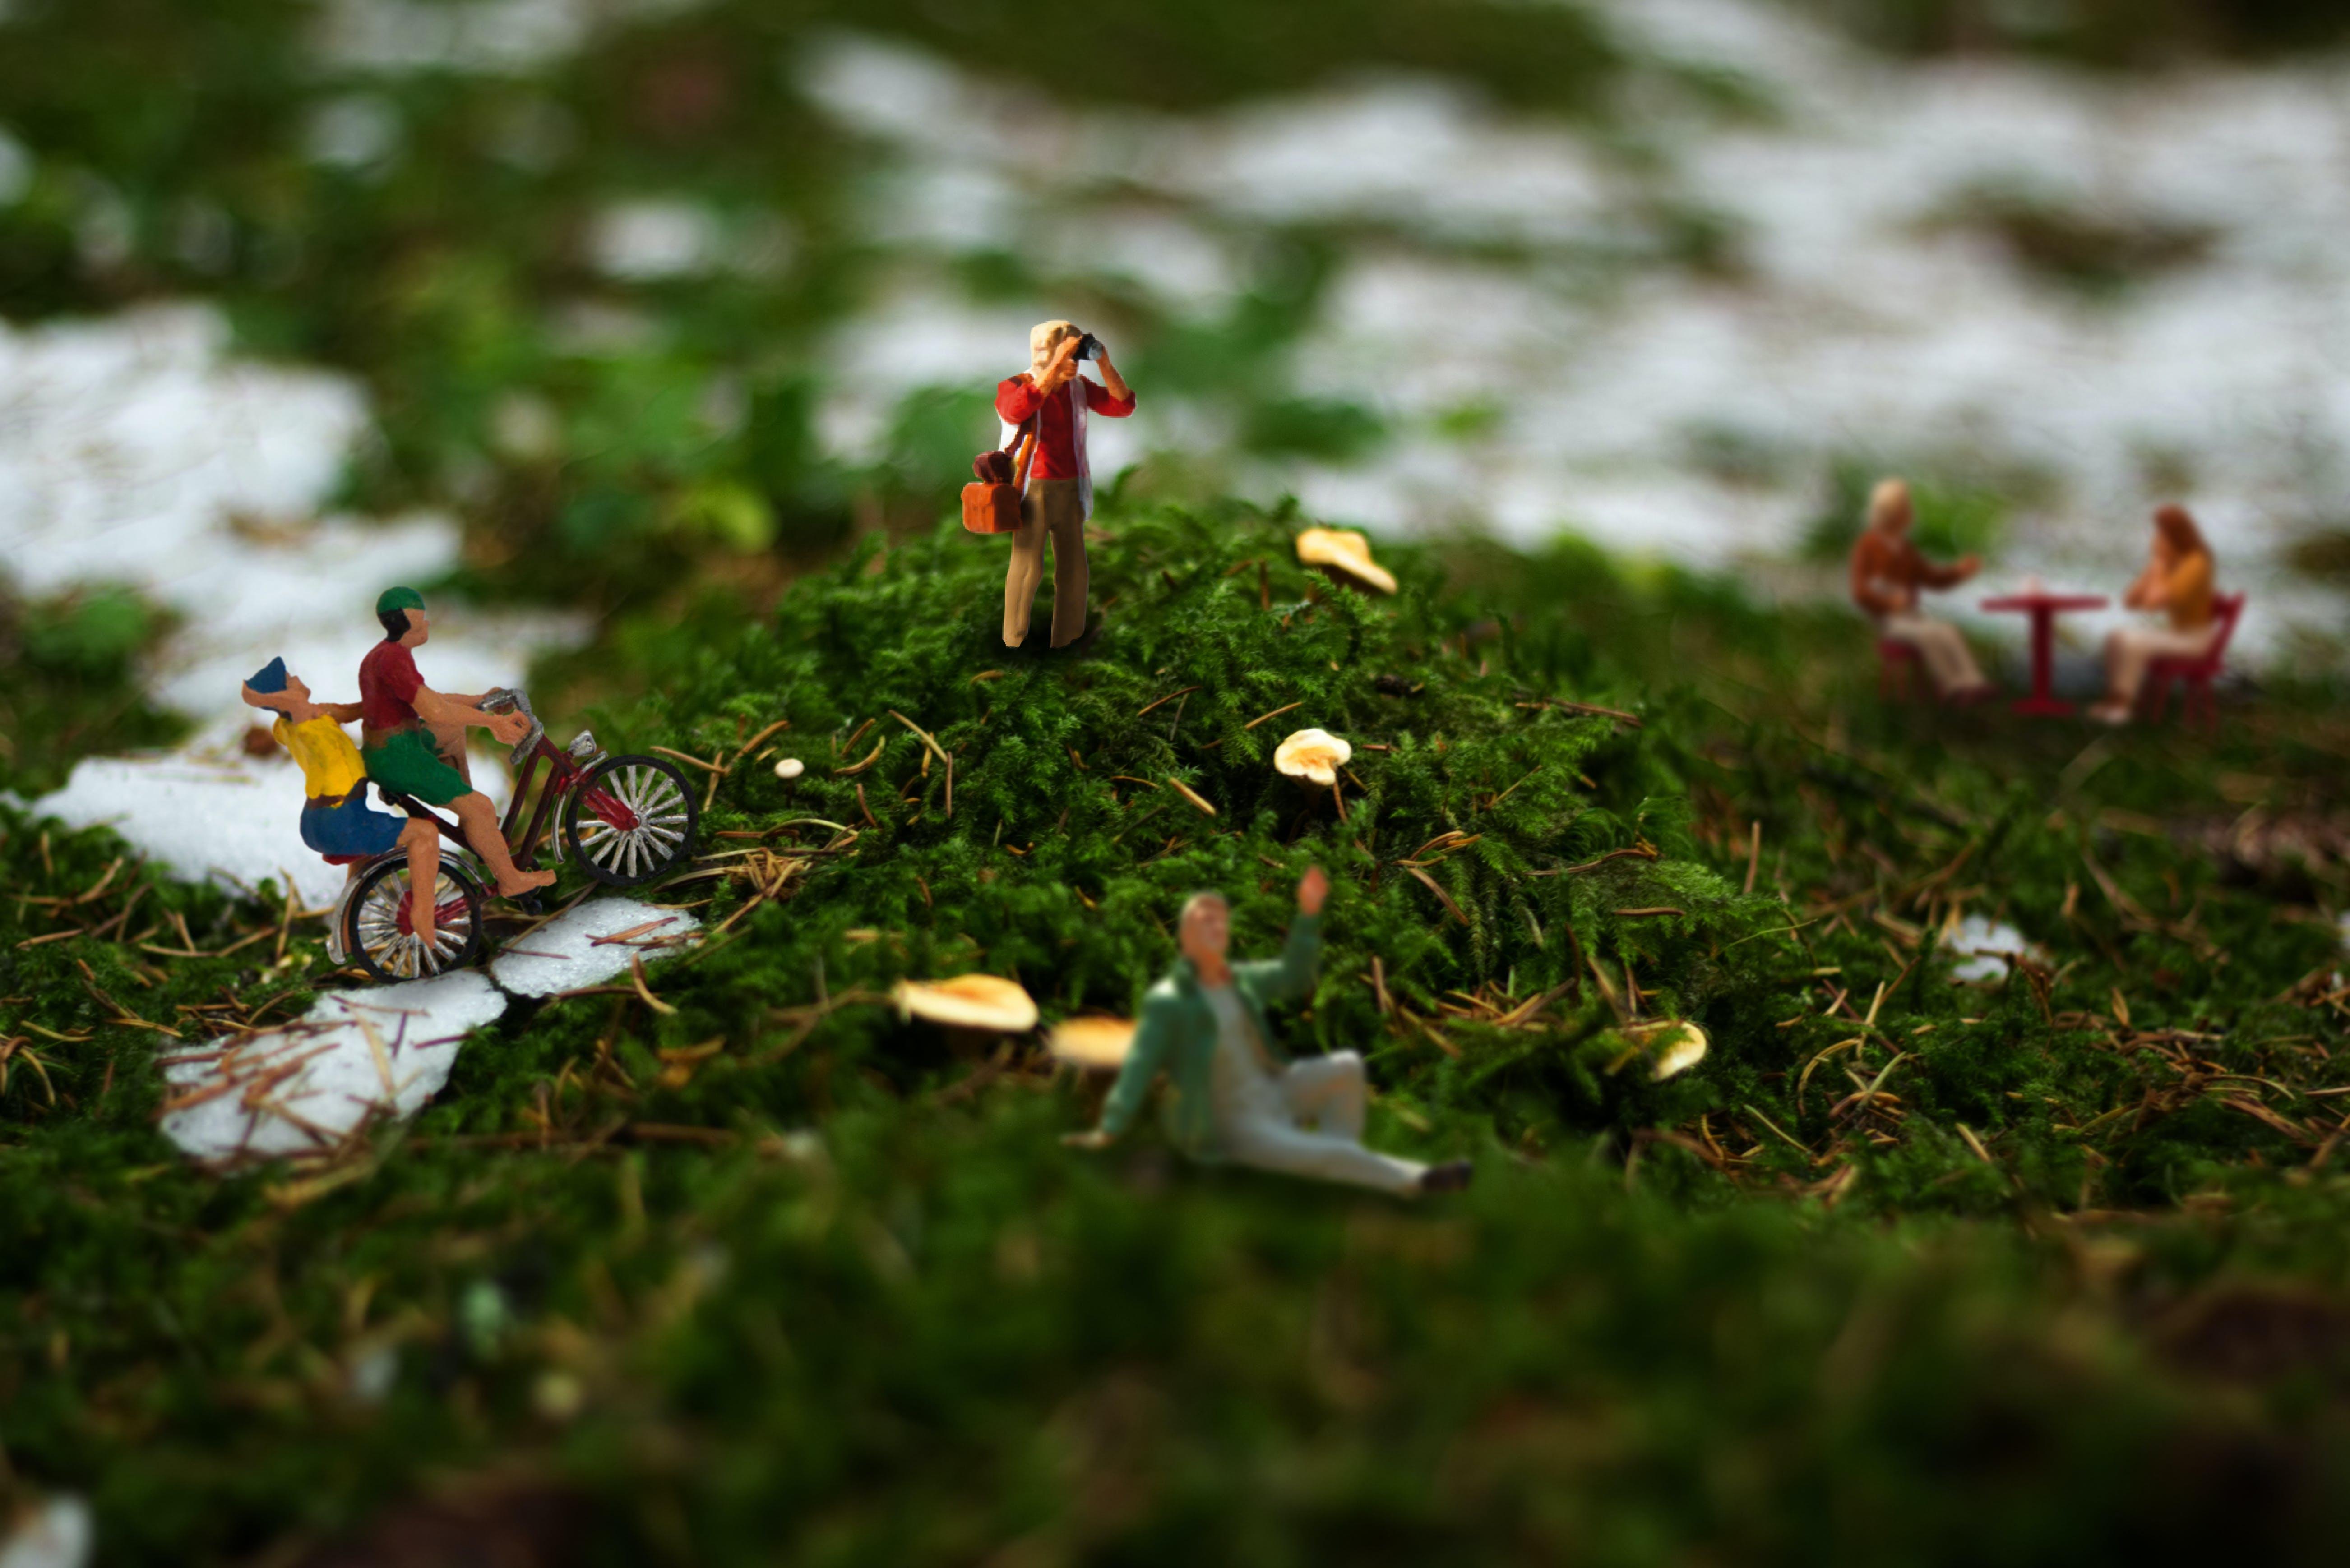 Human Figure Toys on Grass Field